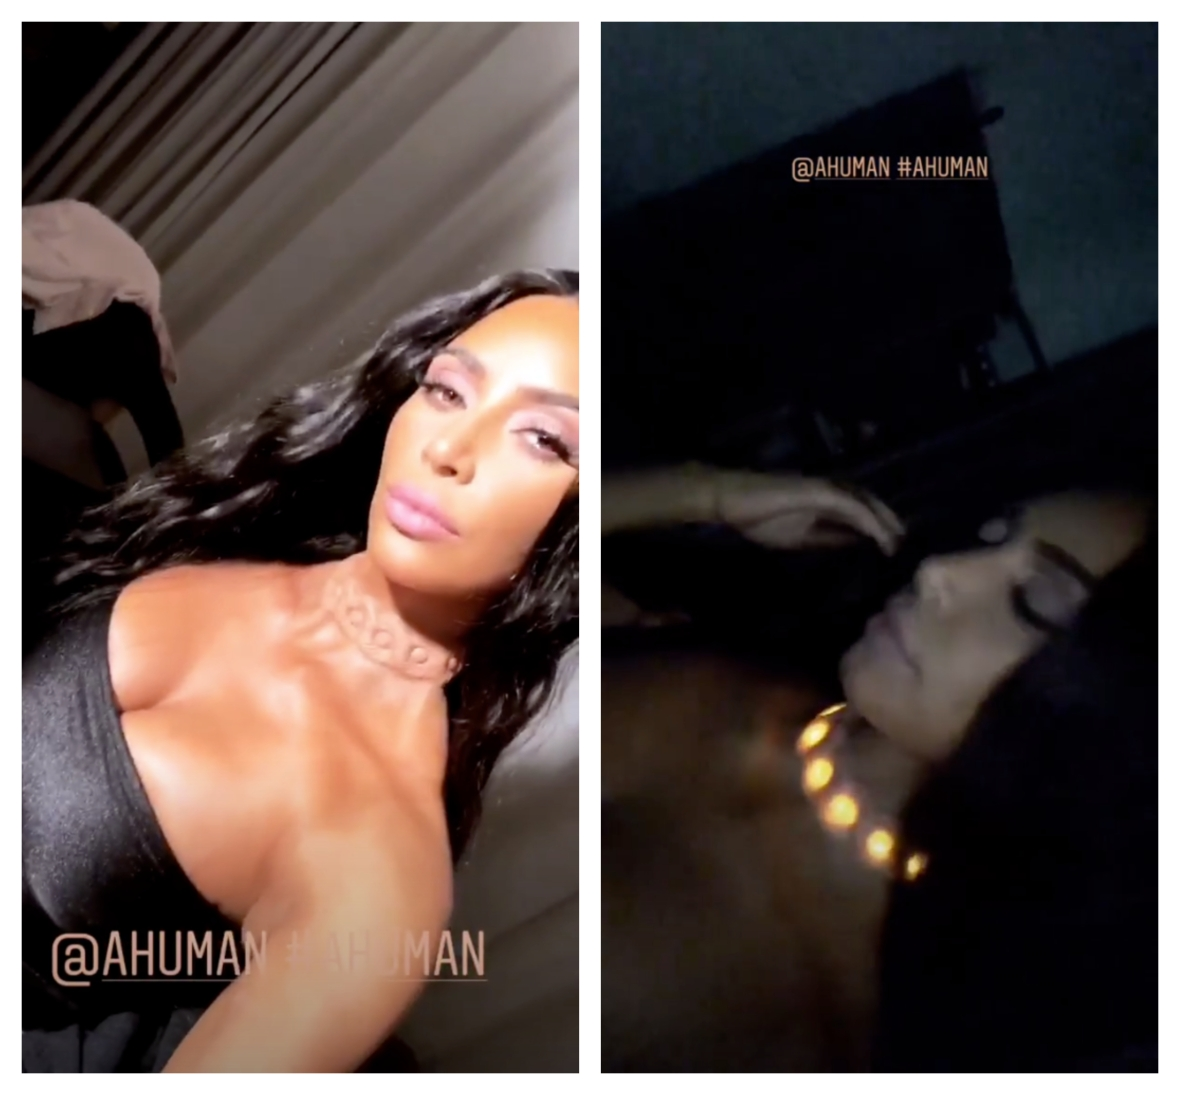 kim kardashian a. human necklace implant